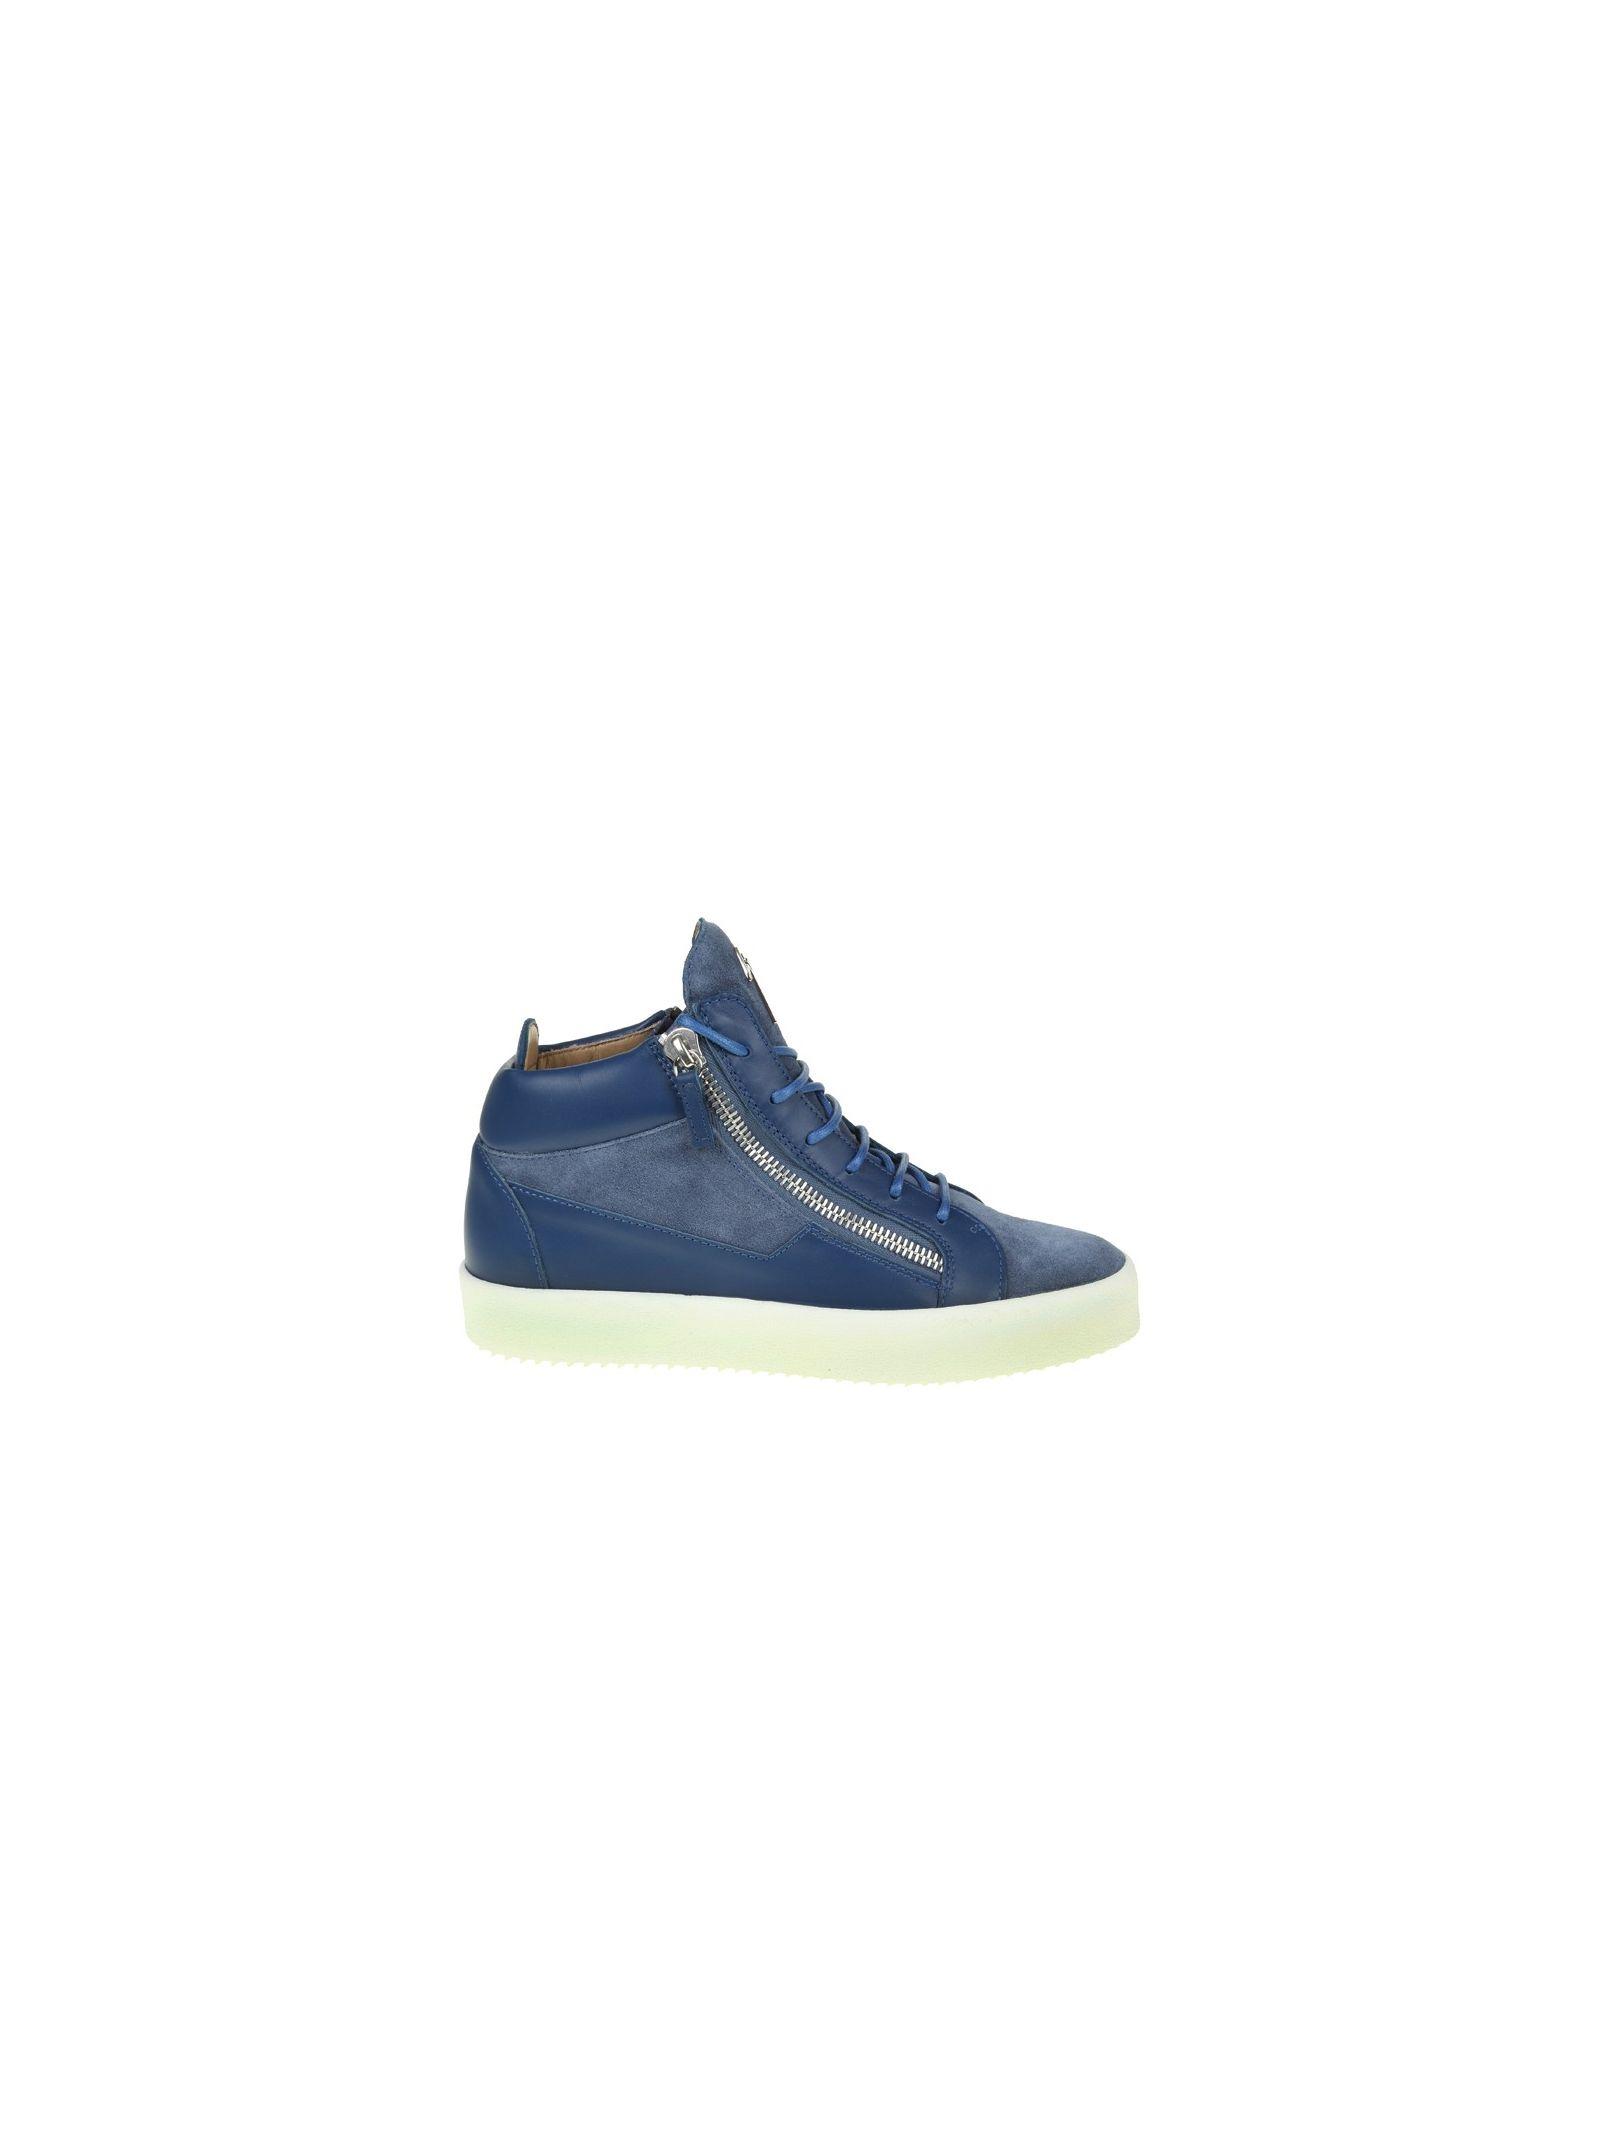 Giuseppe Zanotti Sneakers Blu Avio